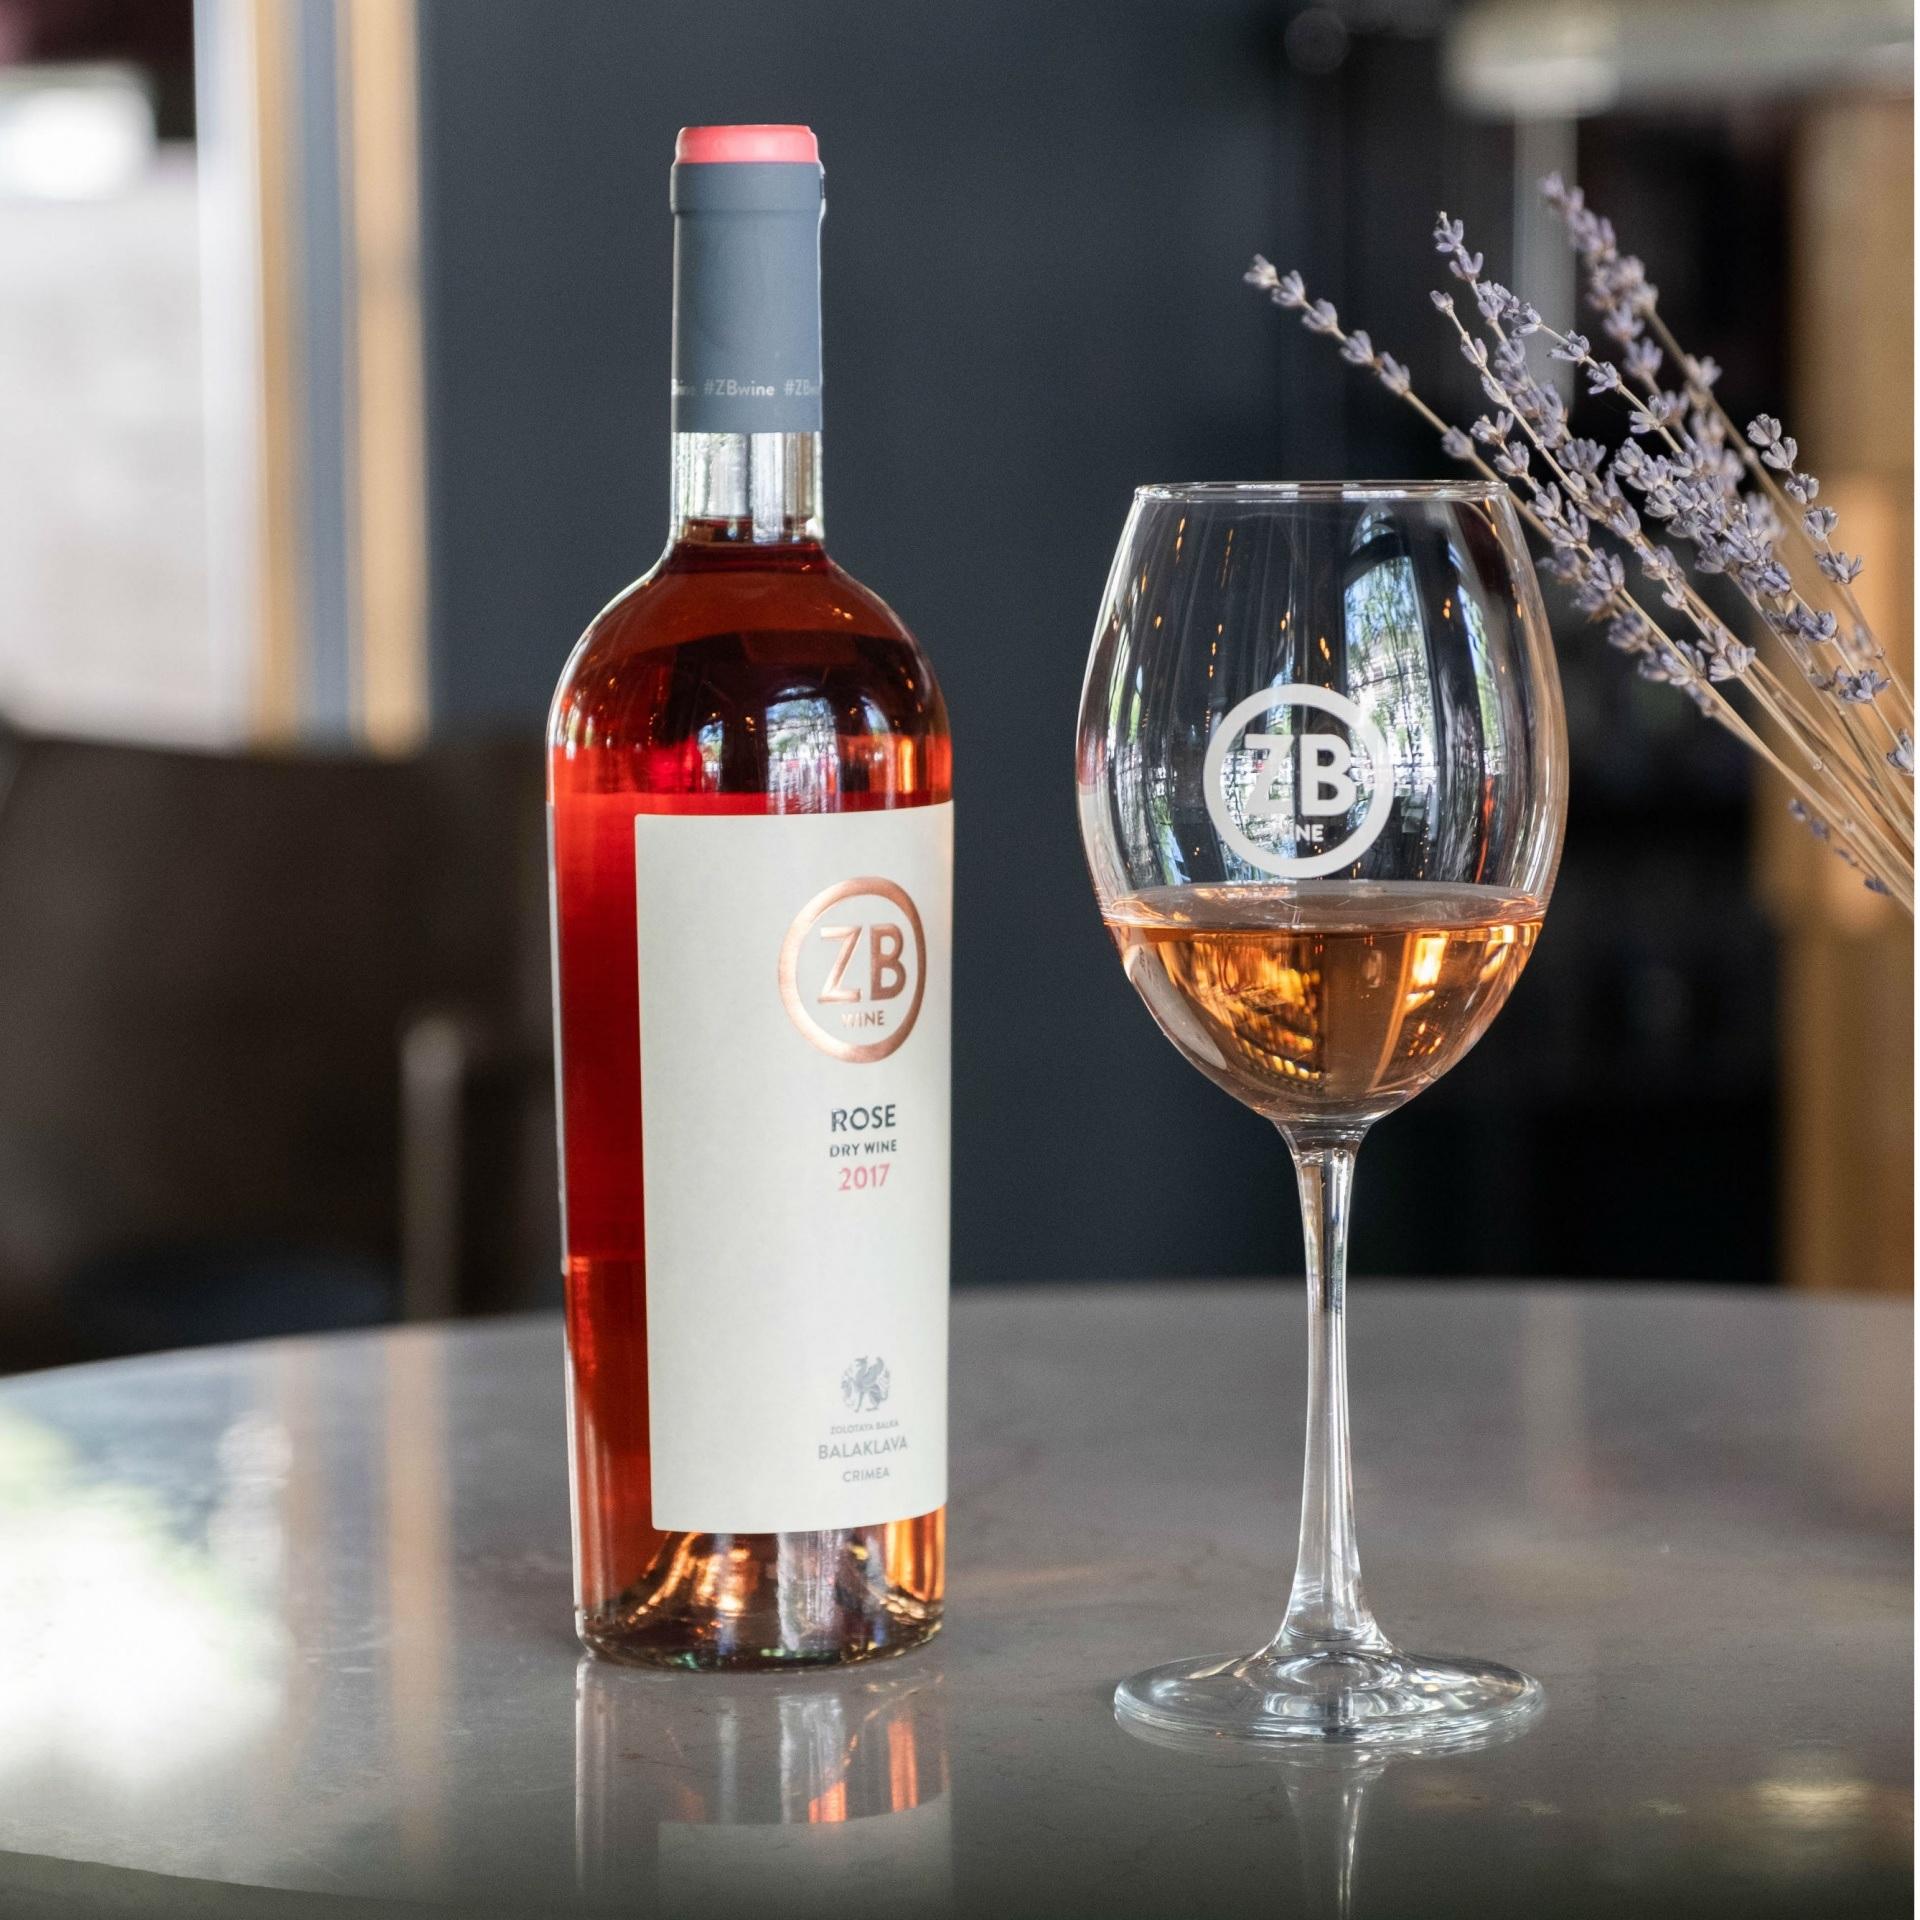 Zolotaya Balka «zb Wine» Rose Dry